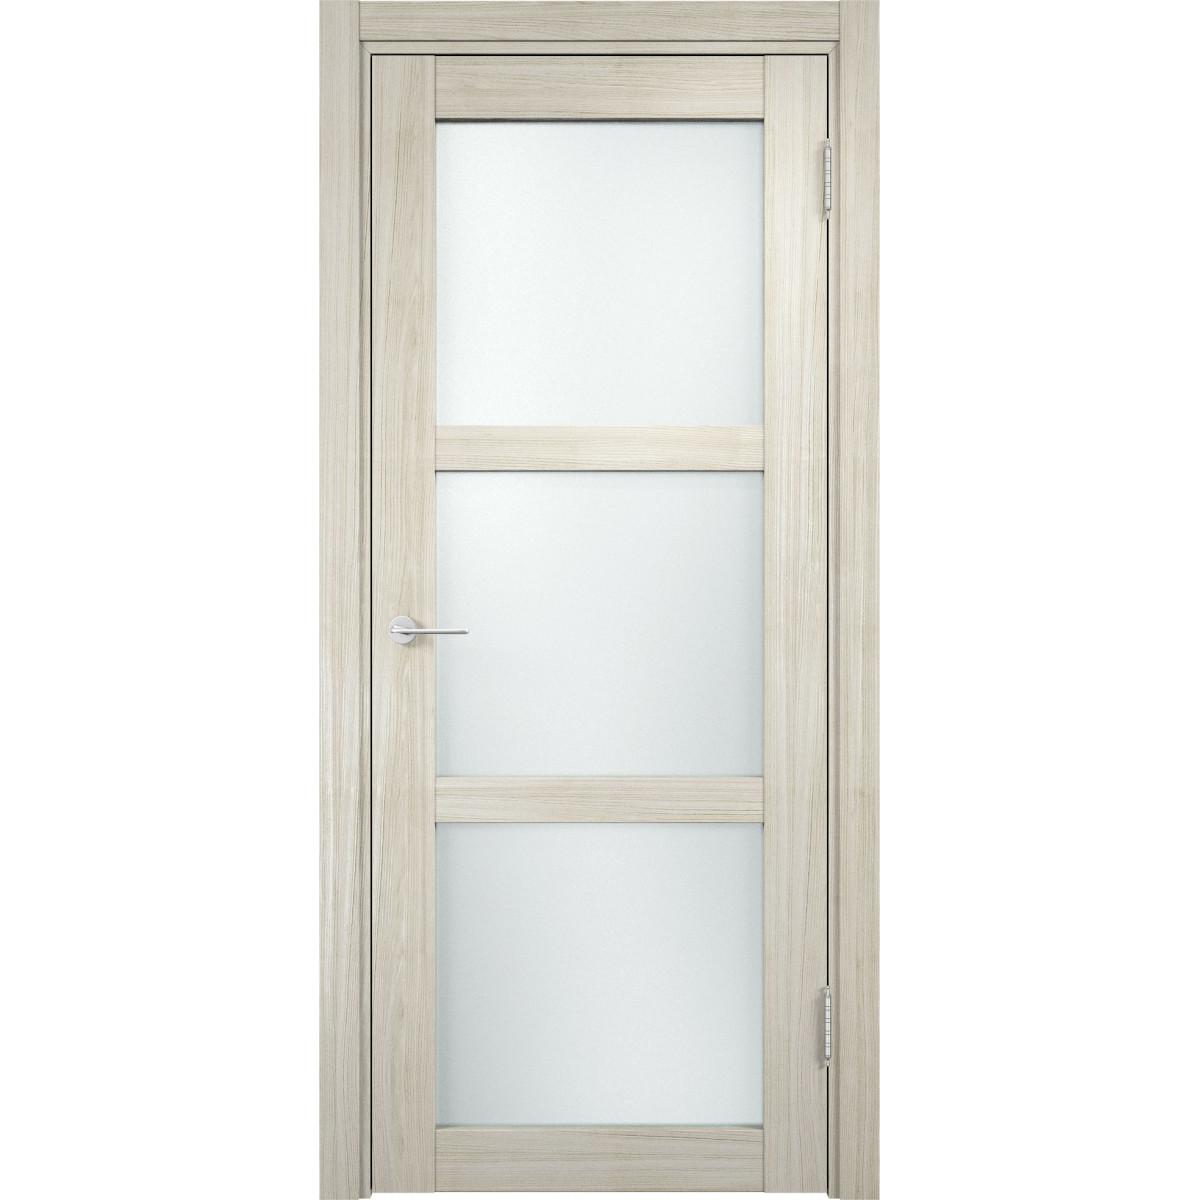 Дверное полотно Casaporte Рома МП_0095 2000х600х44 мм МДФ